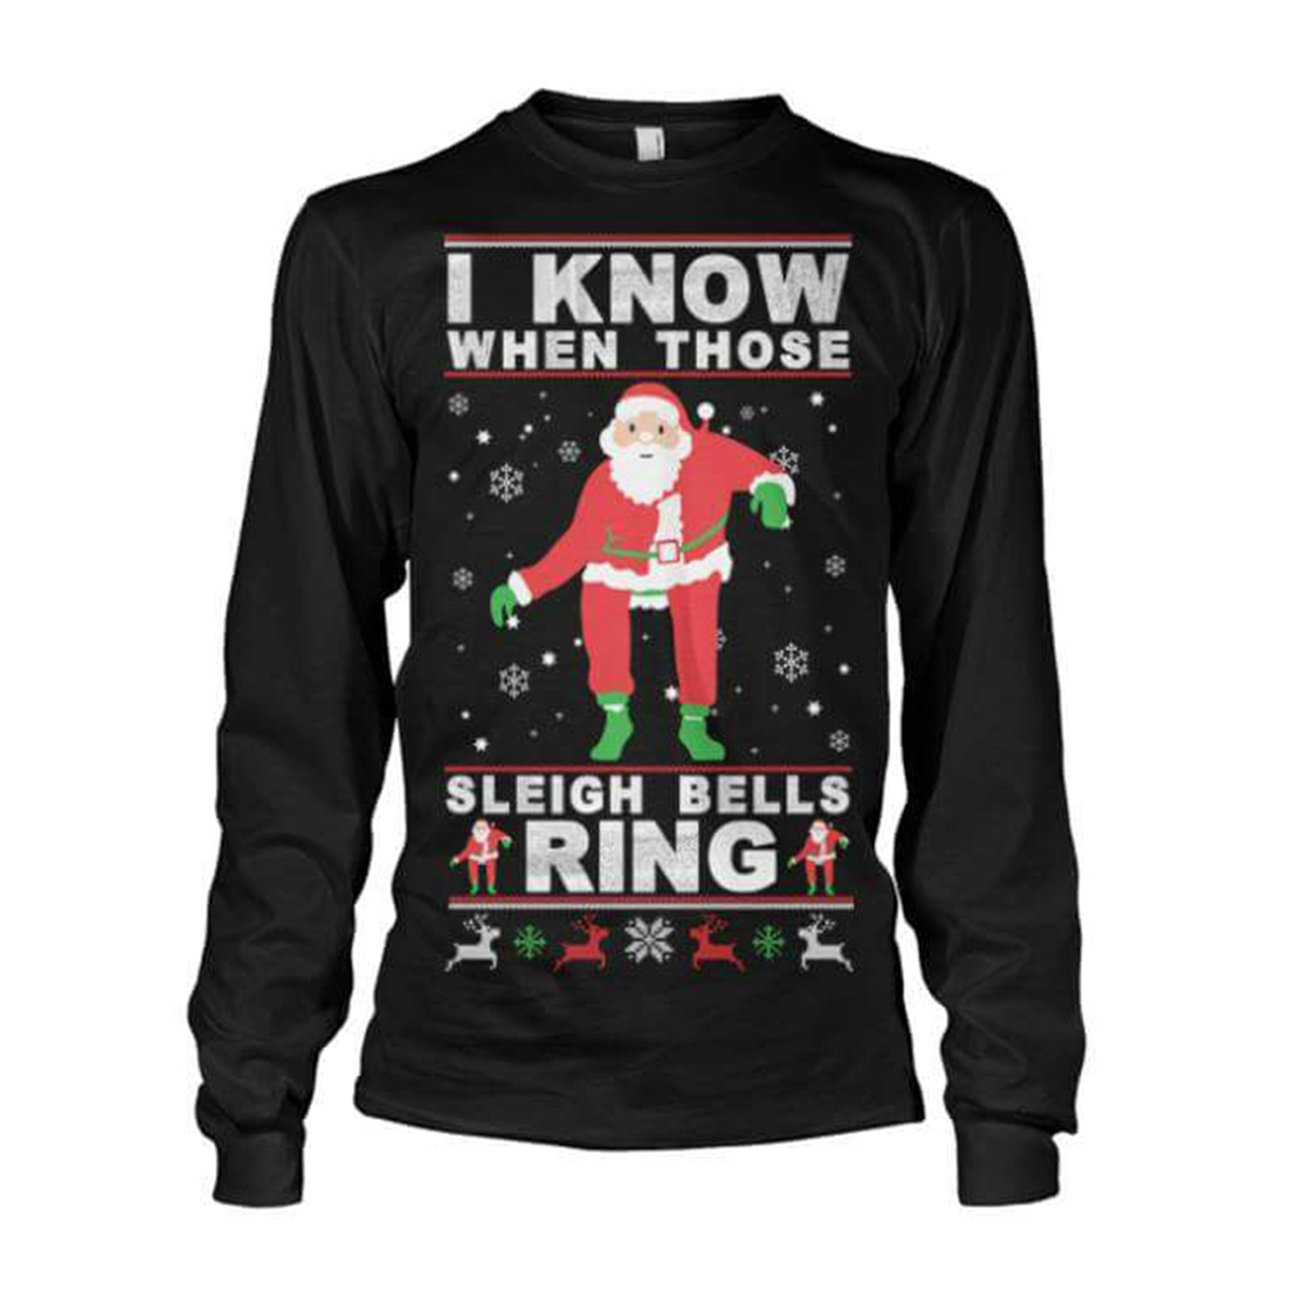 Christmas Tops.Malaika Womens Limited Edition Ugly Christmas Sleigh Bell Ring Ladies Santa Sweatshirt Girls Novelty Vintage Retro Christmas Sweater Printed Tops